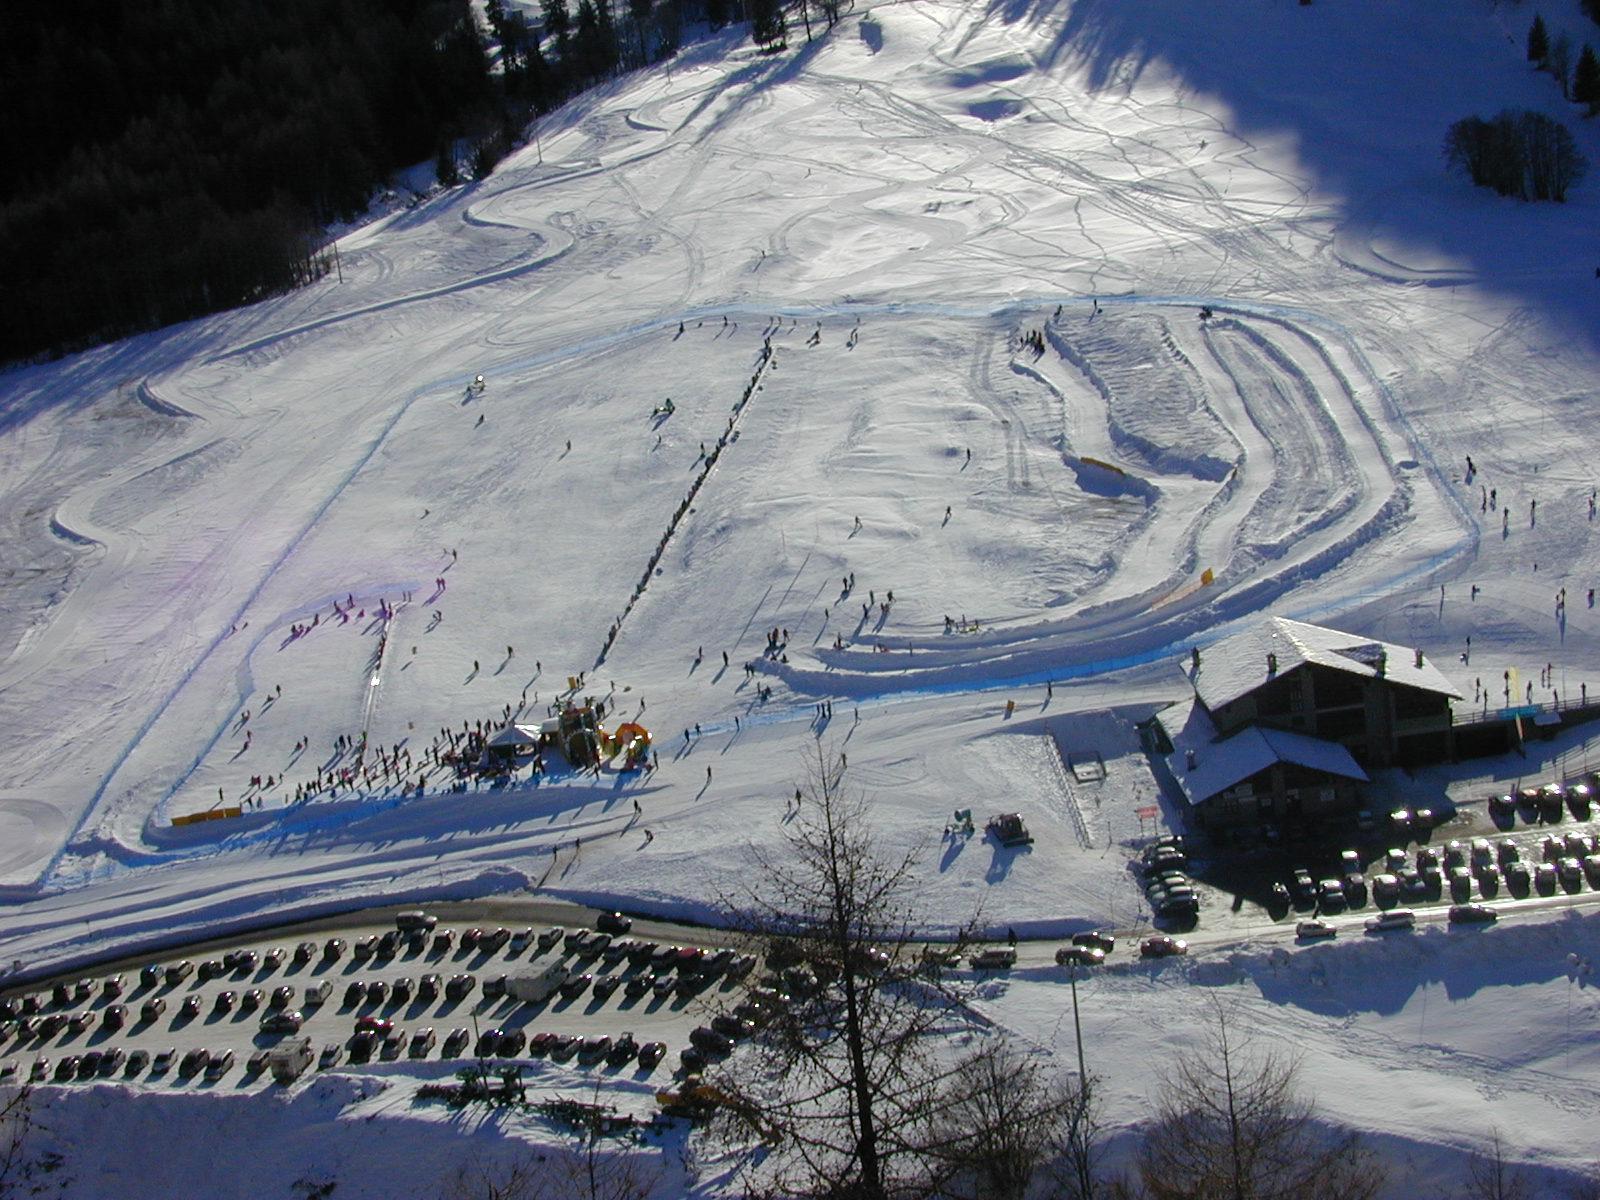 Flassin Snow Park4 02 01 04